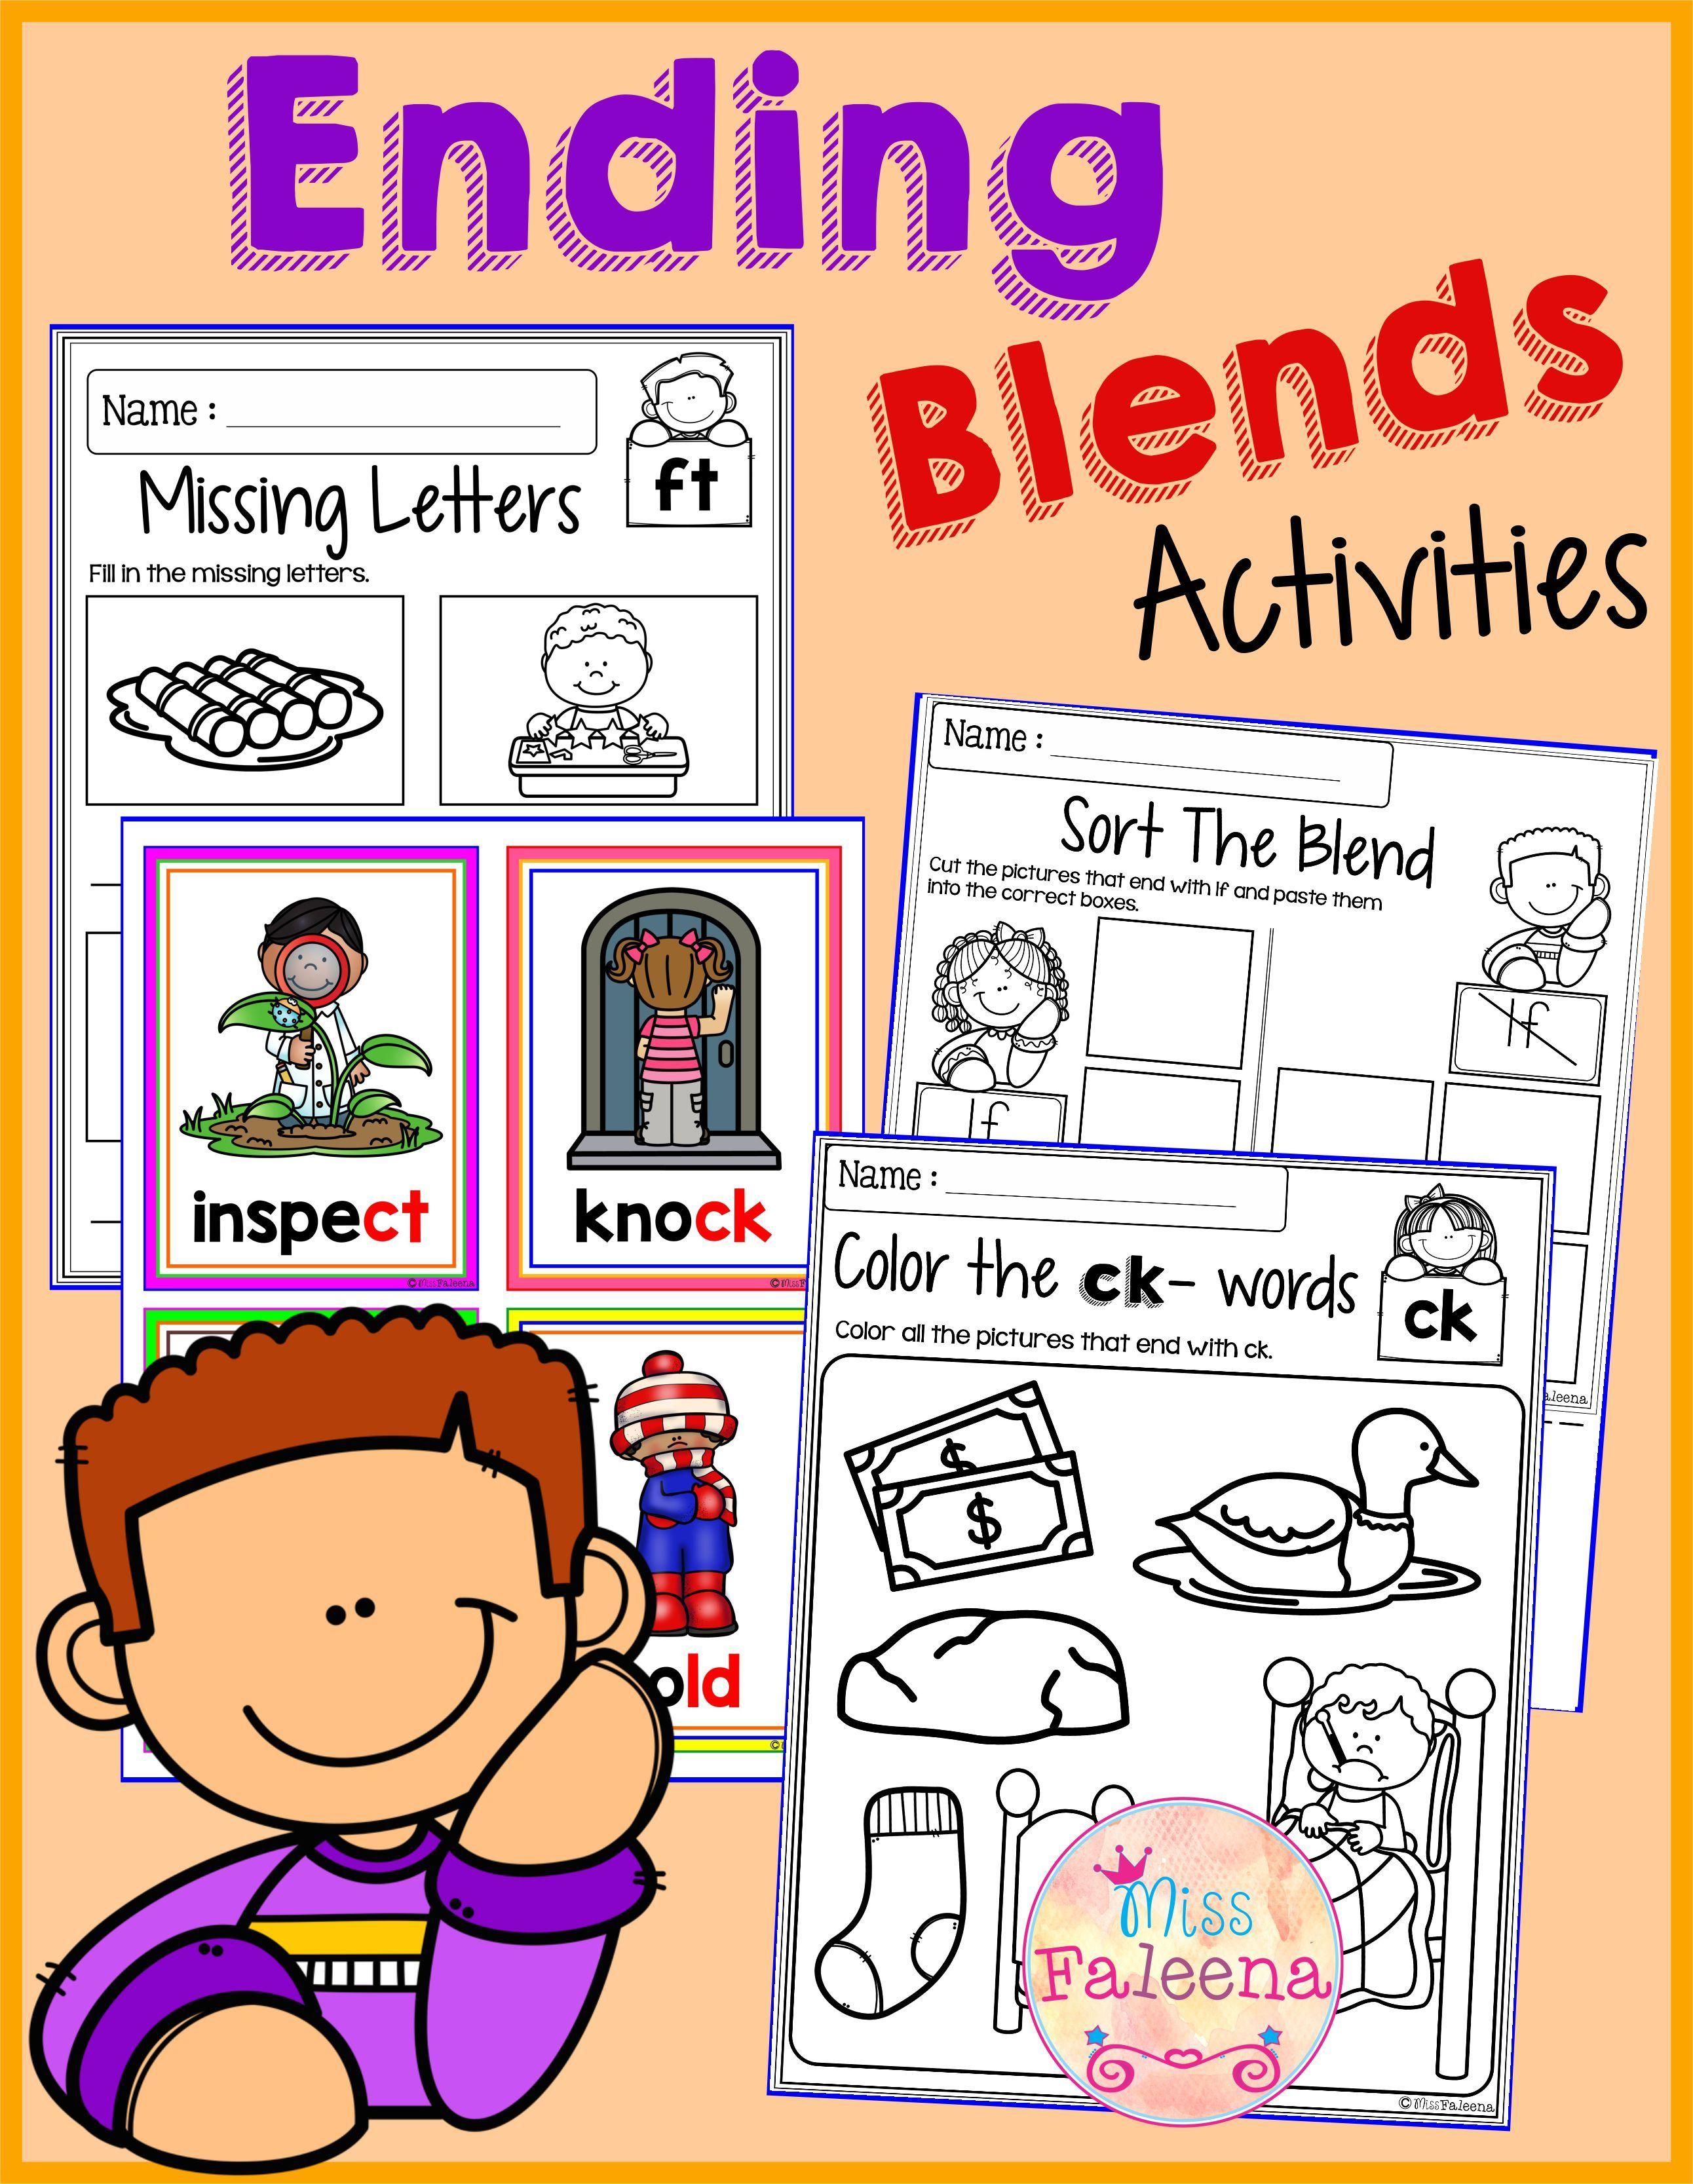 The Ending Blends Activities